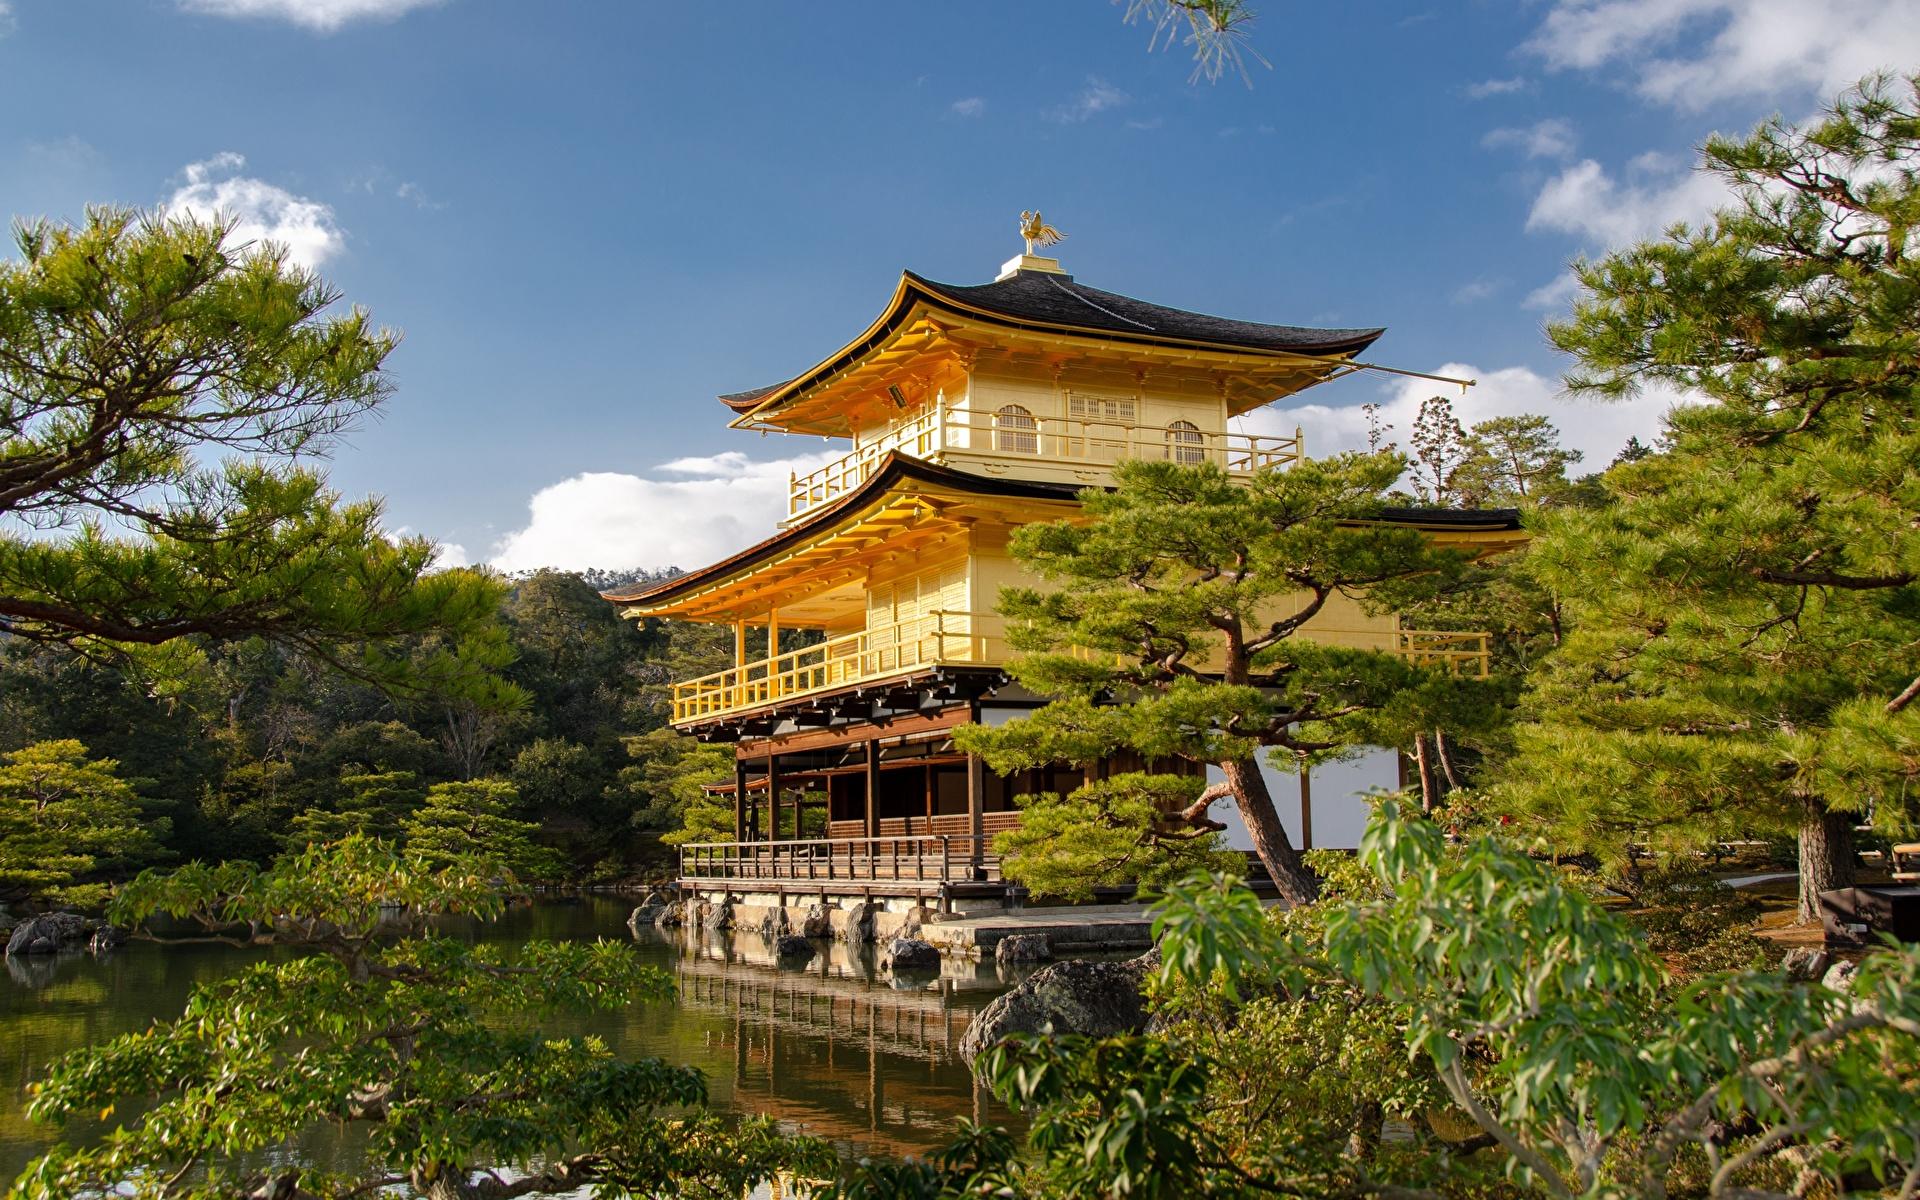 Wallpaper Kyoto Japan Kinkaku-JI Gardens temple Cities 1920x1200 Temples